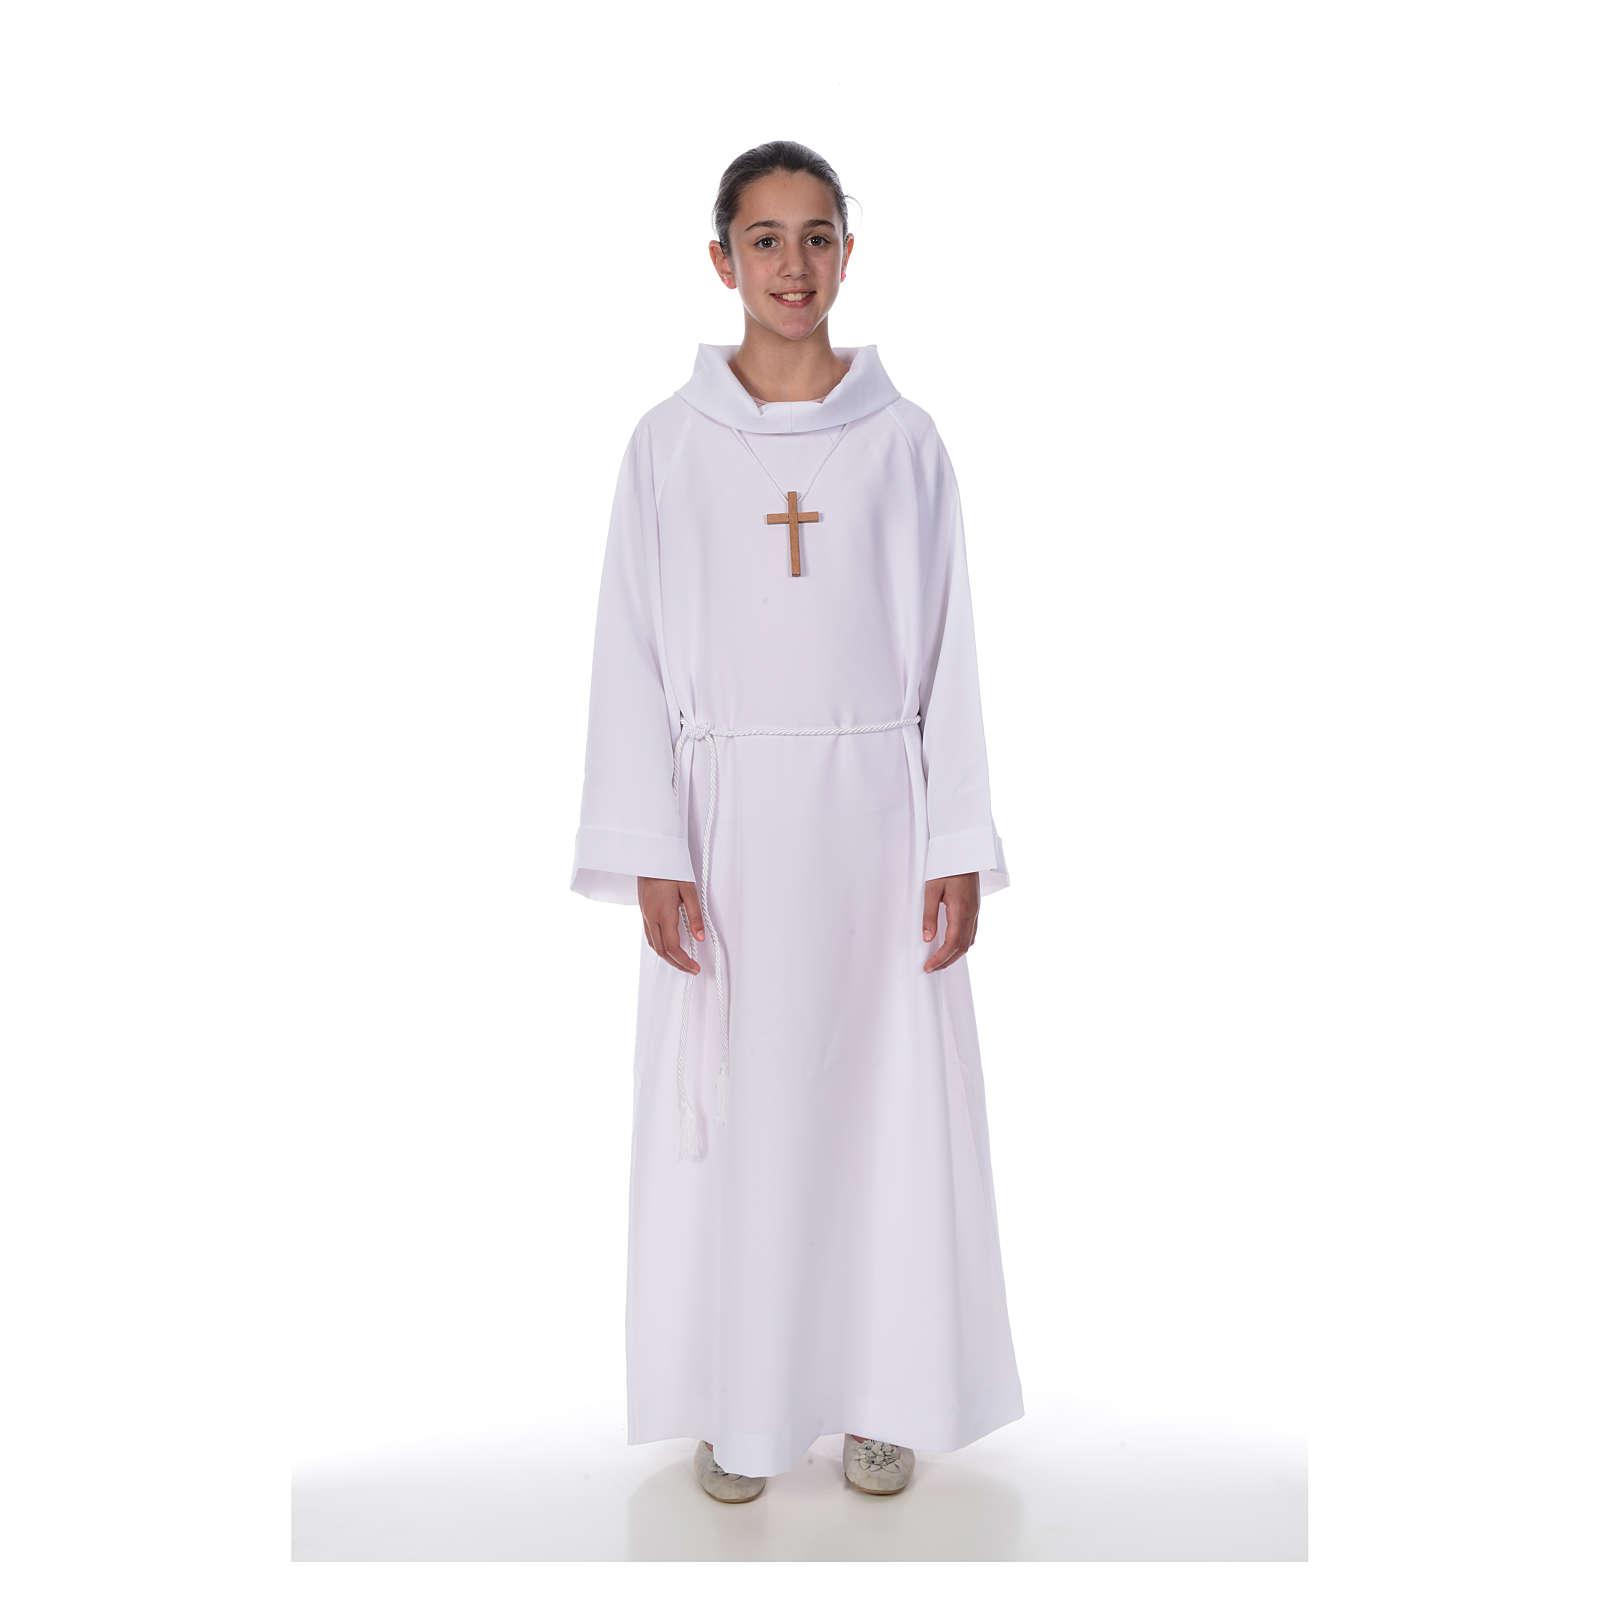 First Communion alb, Economy model 4